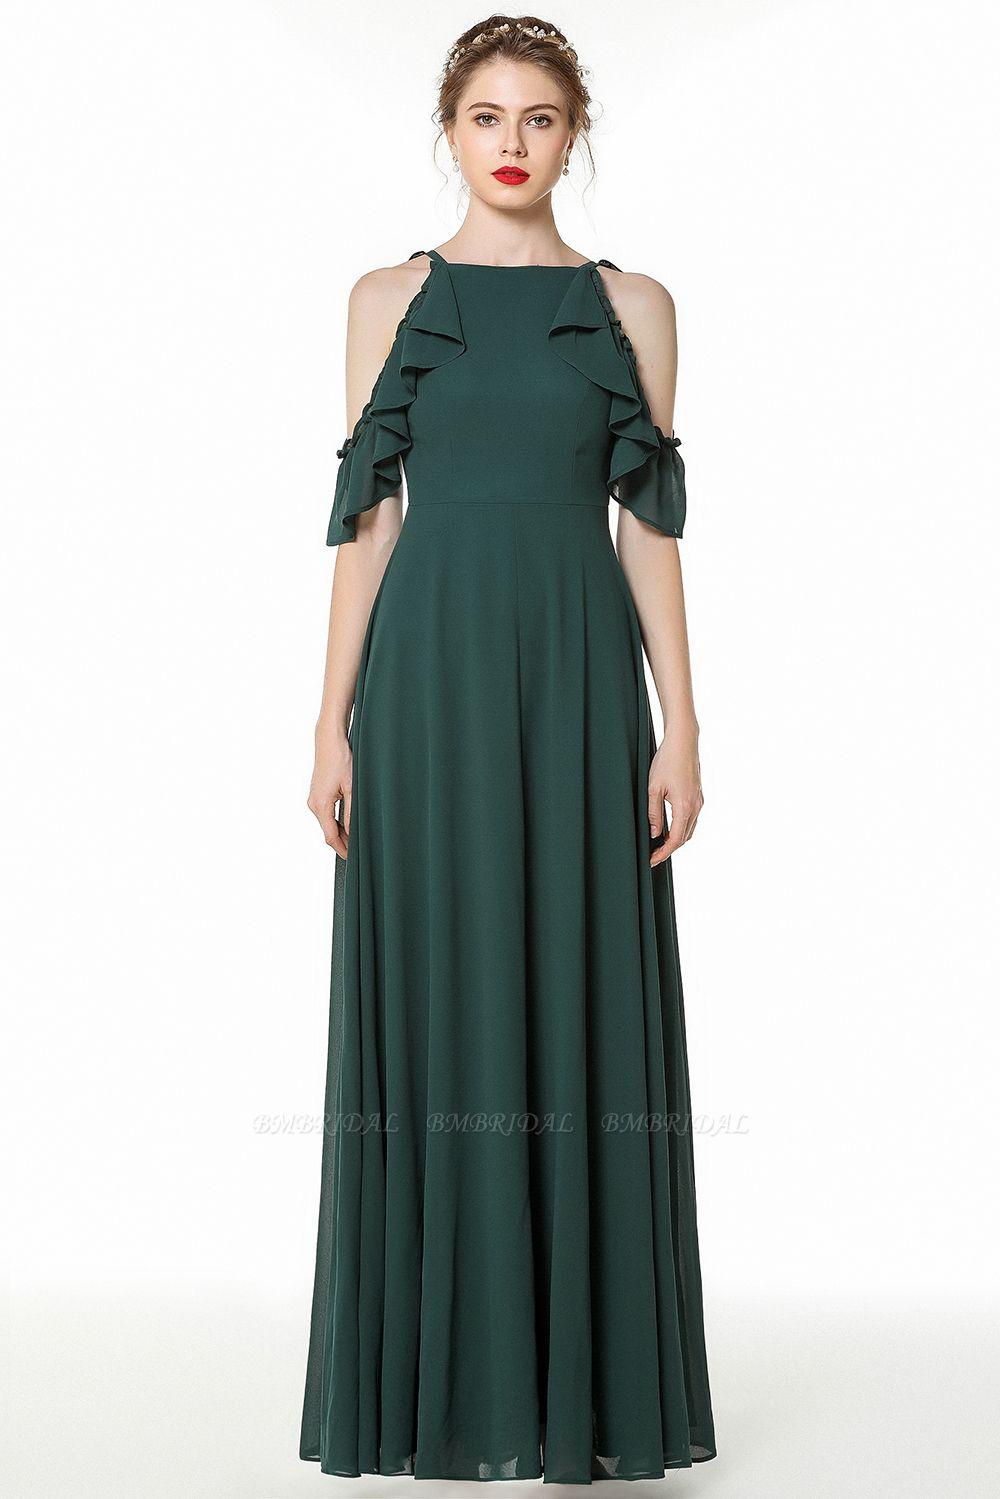 BMbridal Chic Cold-shoulder Ruffle Dark Green Chiffon Bridesmaid Dresses Online